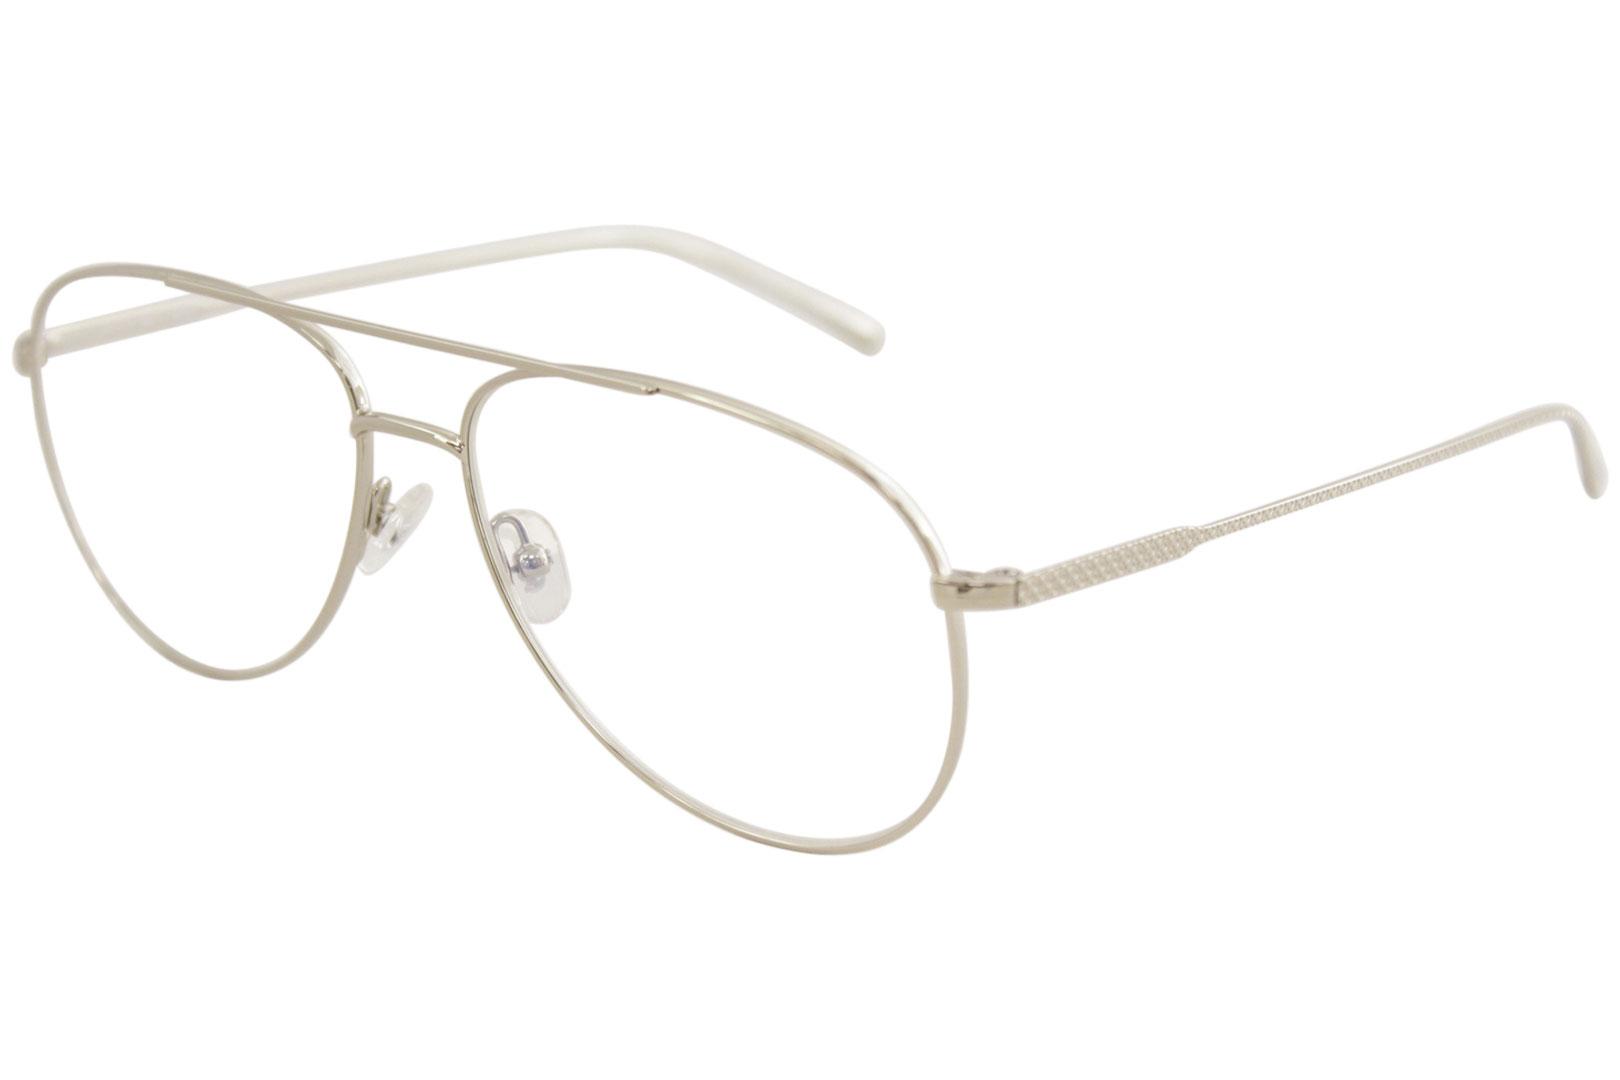 050d8c11cae7 Lacoste Men s Eyeglasses L2505PC L 2505 PC 718 Gold Full Rim Optical ...